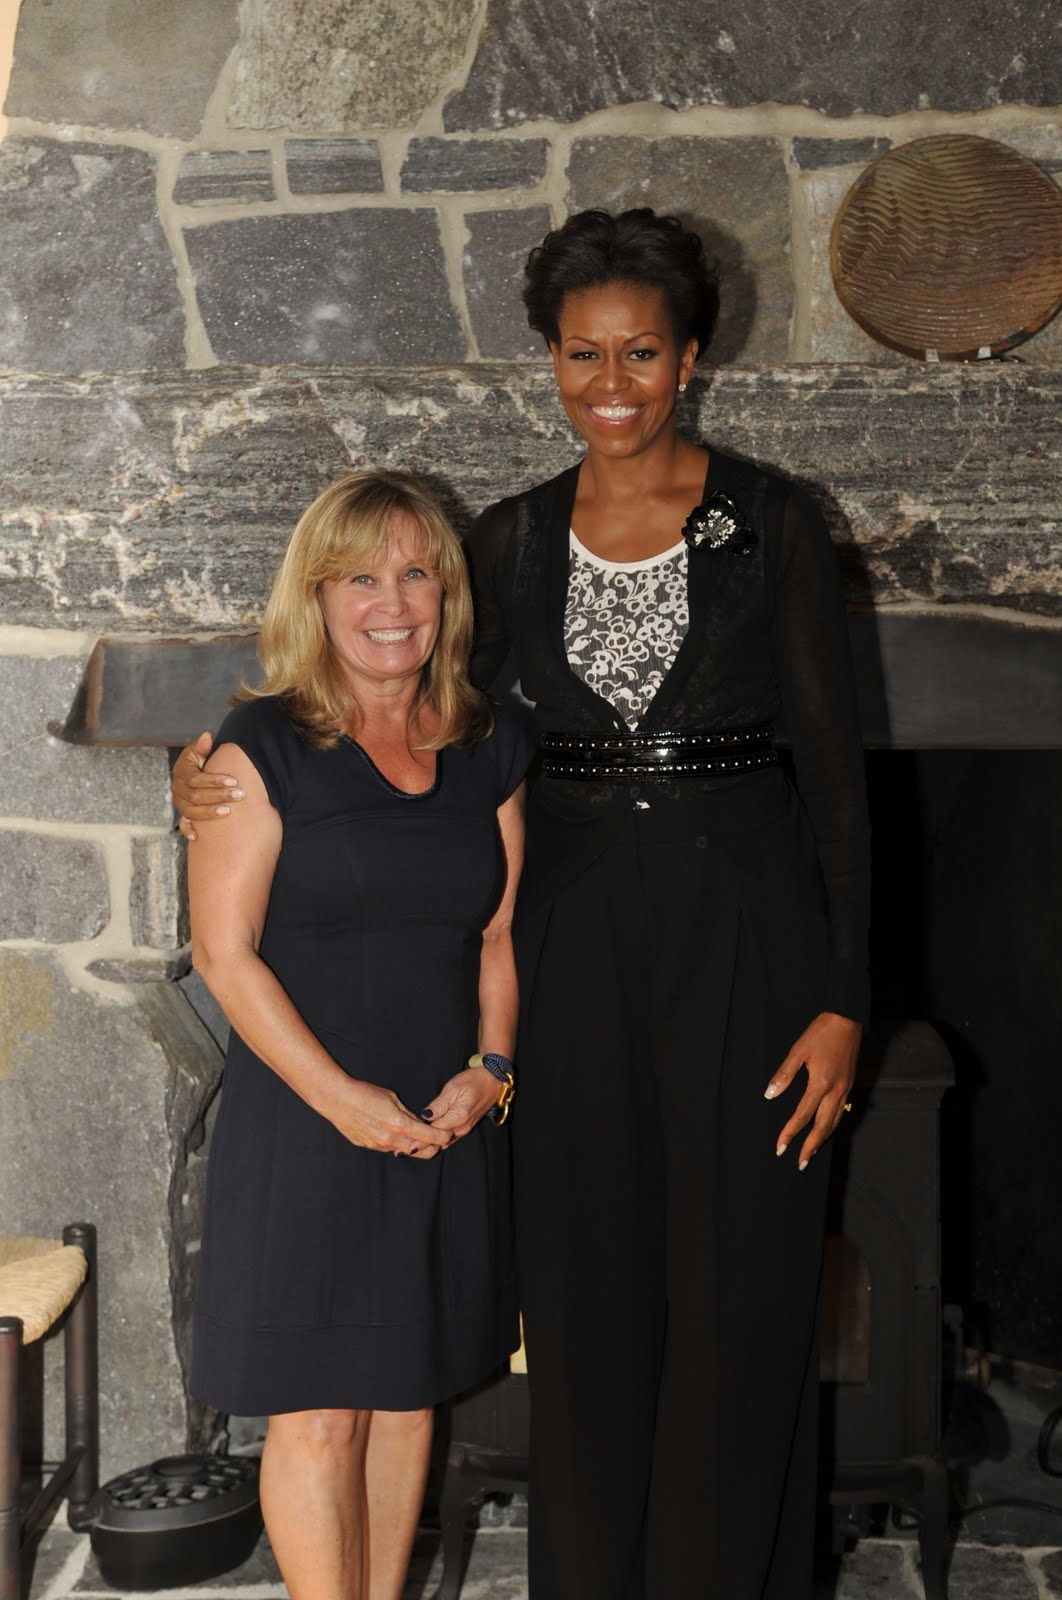 MoreAbout-CPK&MichelleObama.jpg